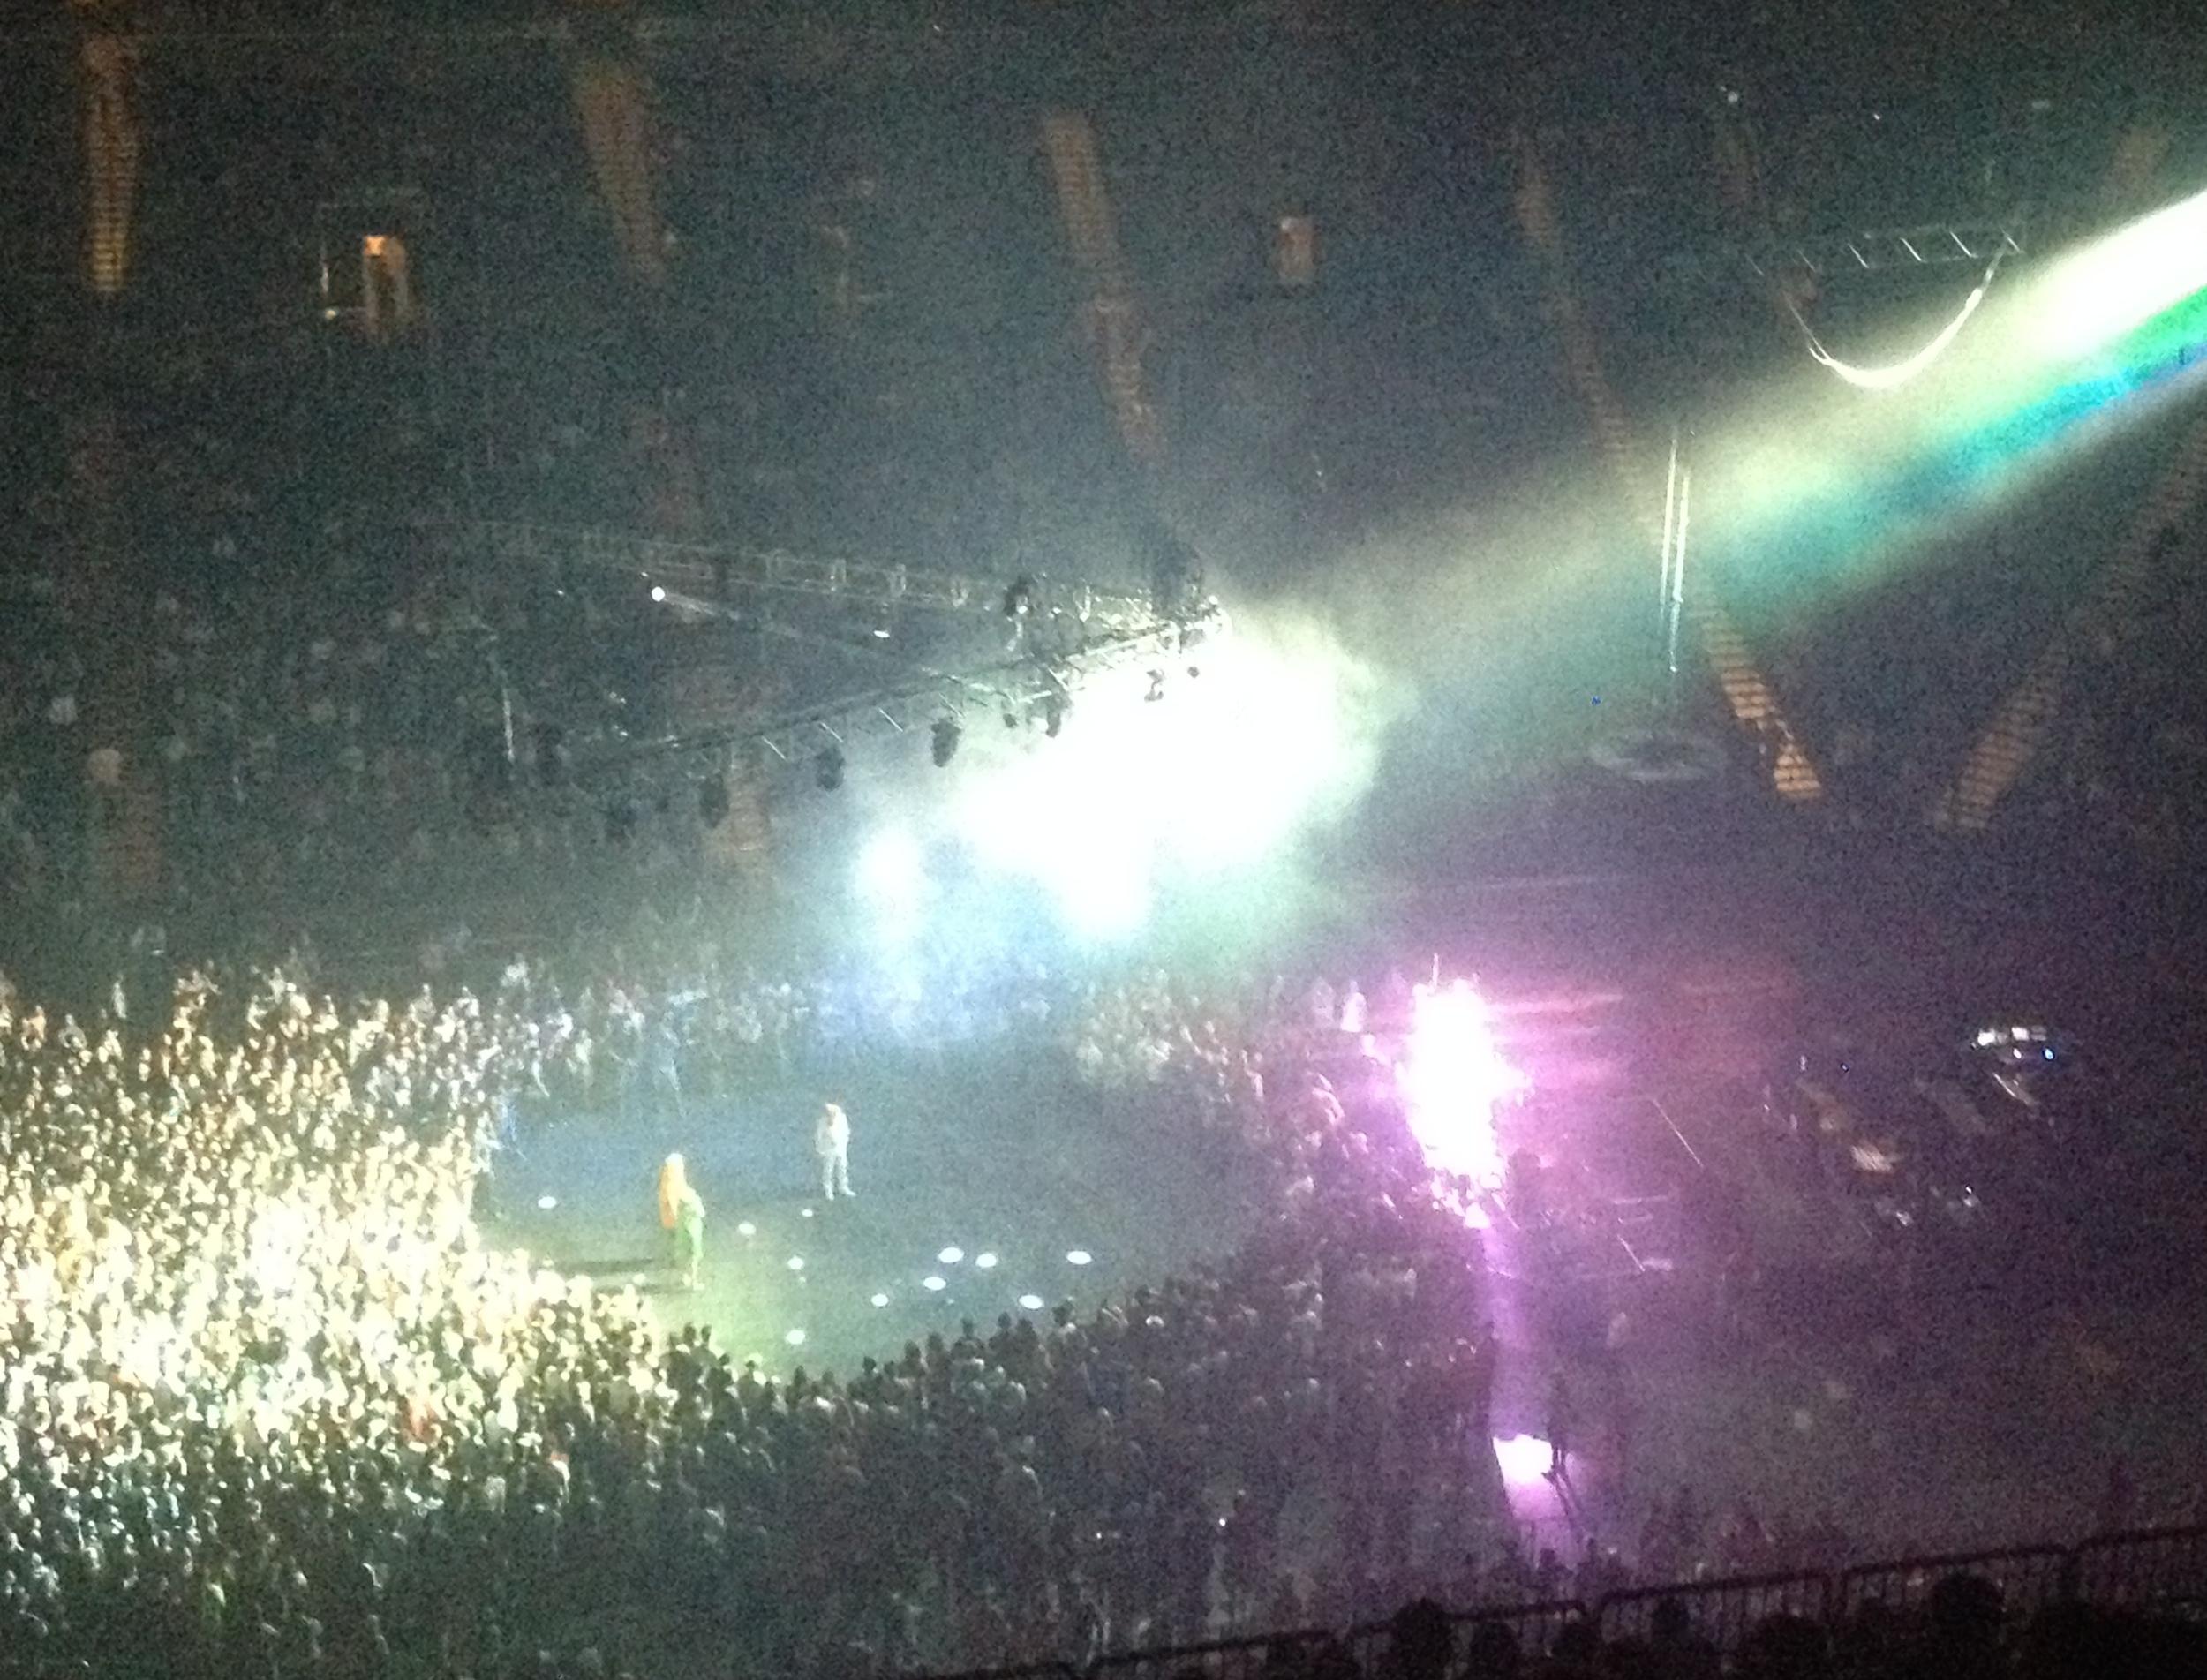 Dan Deacon as DJ prior to Arcade Fire. Crazy dance moves occurring.